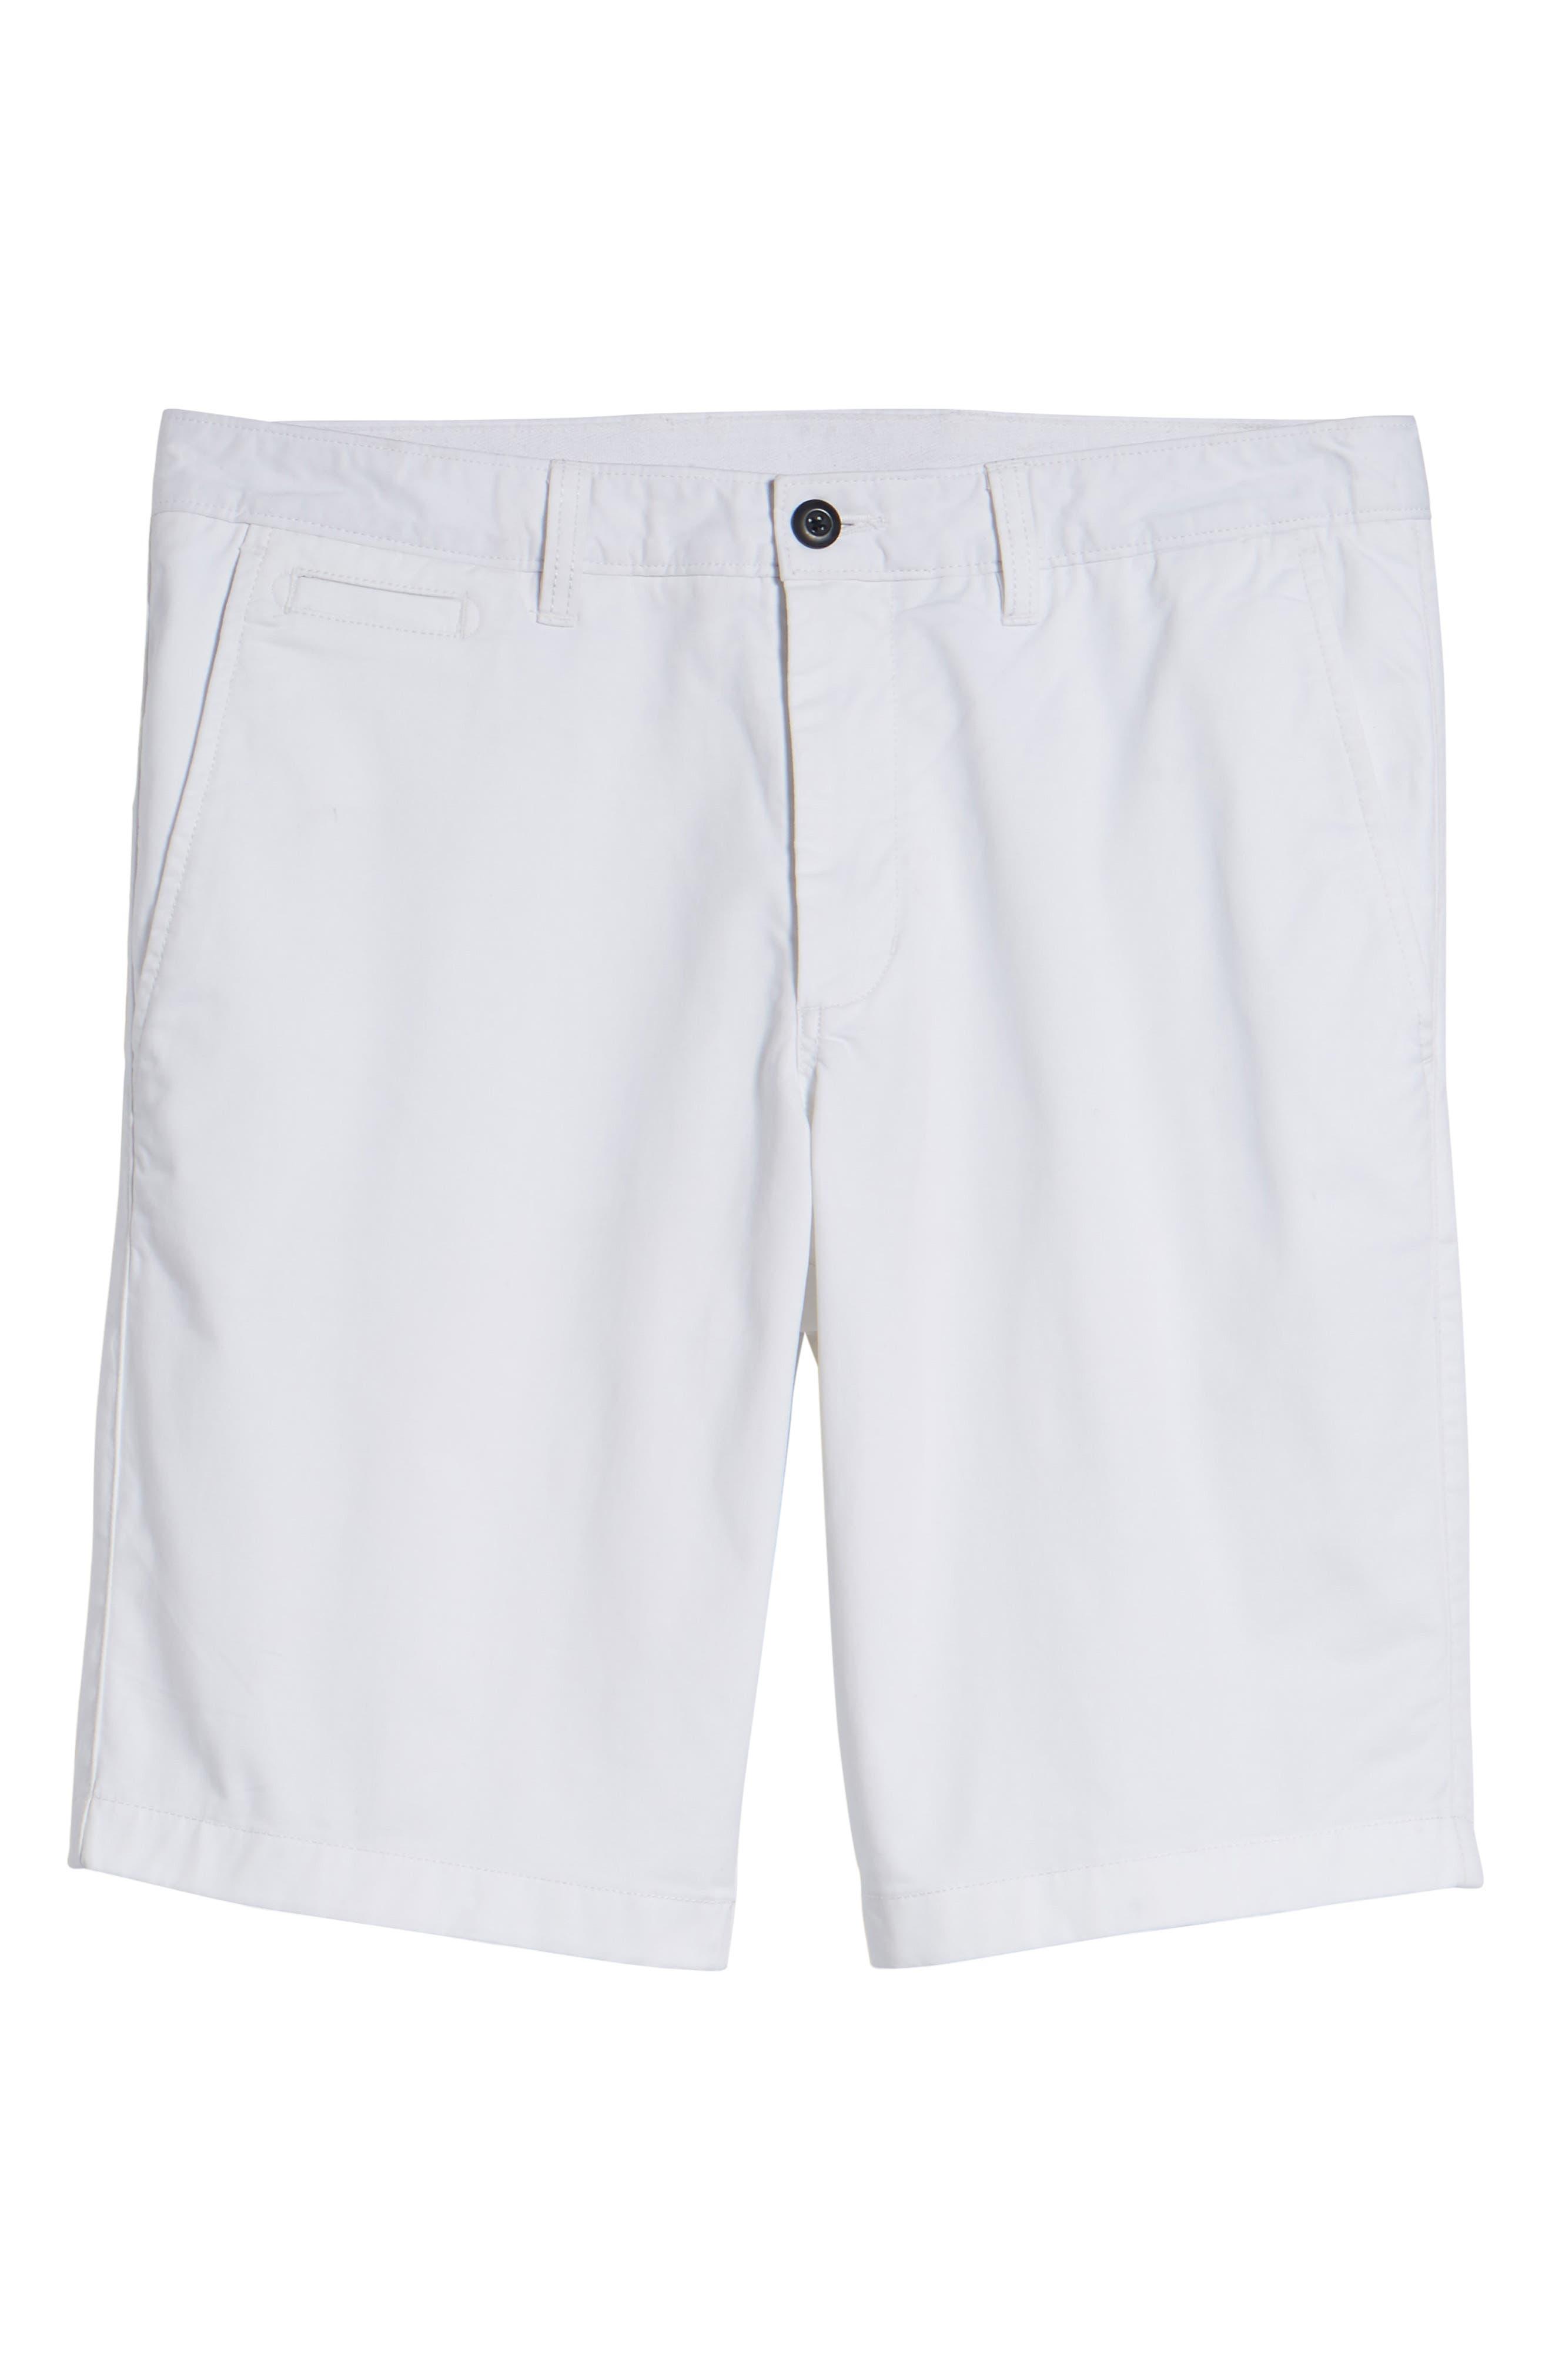 Ballard Slim Fit Stretch Chino 11-Inch Shorts,                             Alternate thumbnail 77, color,